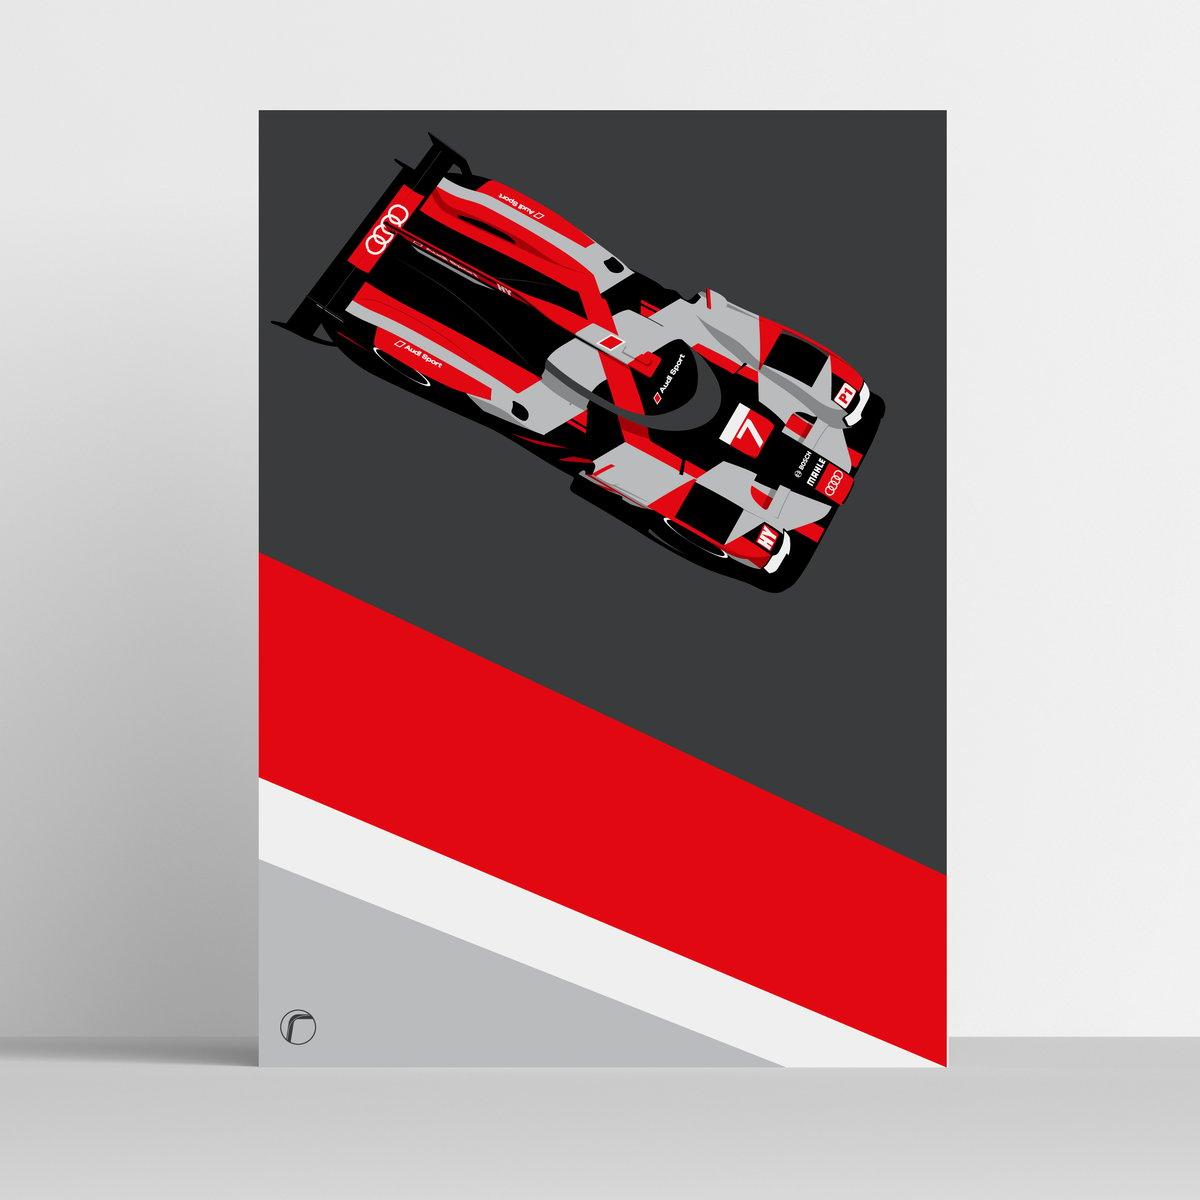 Image of Audi R18 | Silverstone '16